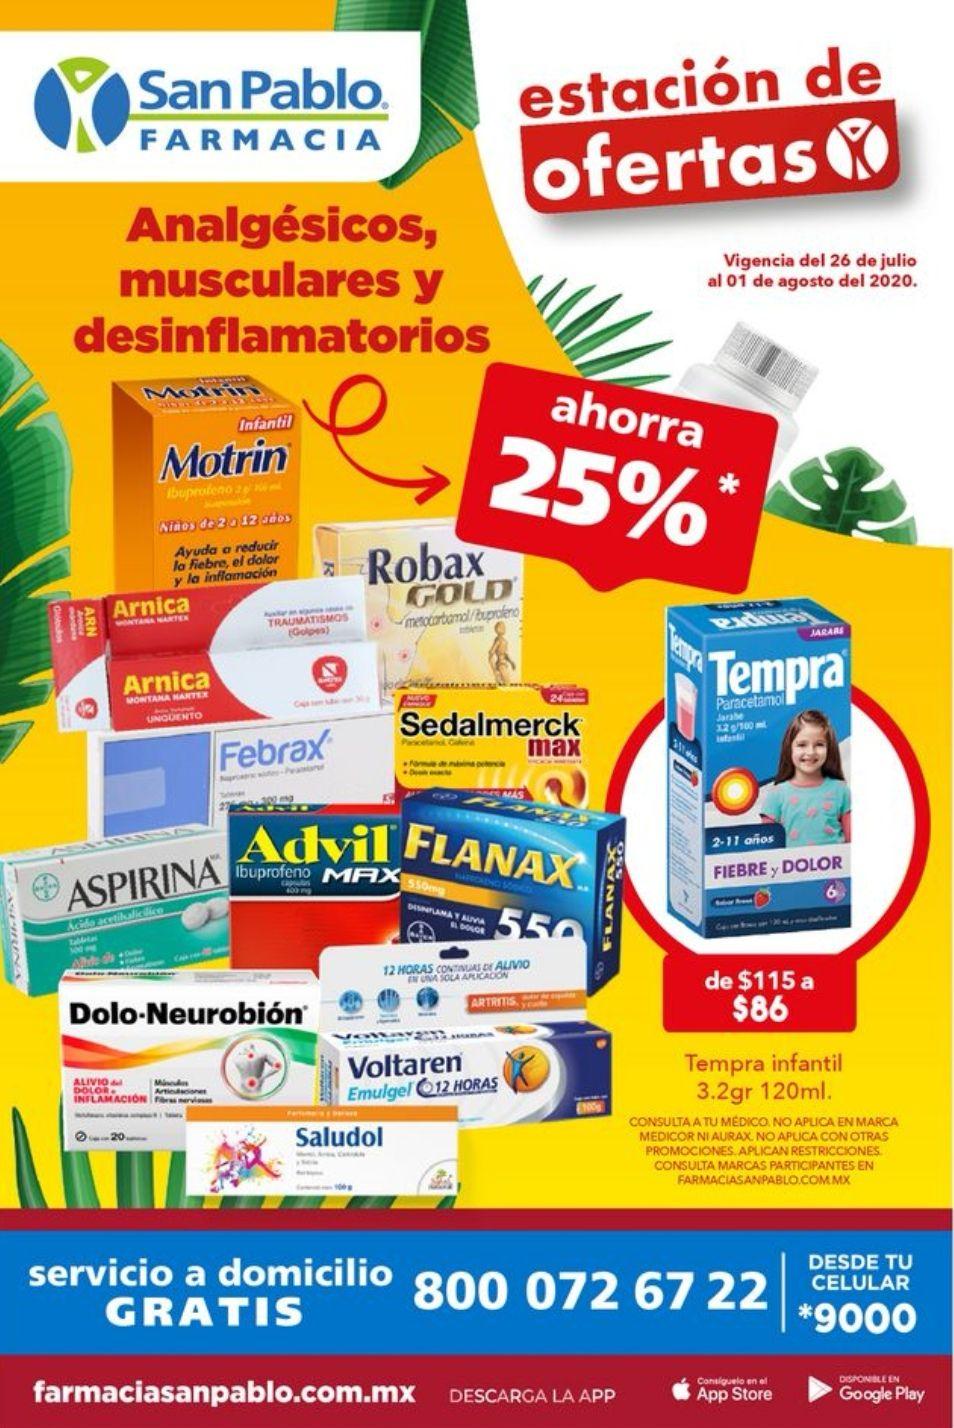 "Farmacias San Pablo: 5° Folleto de Ofertas Semanal ""Estación de Ofertas"" al Sábado 1 de Agosto"